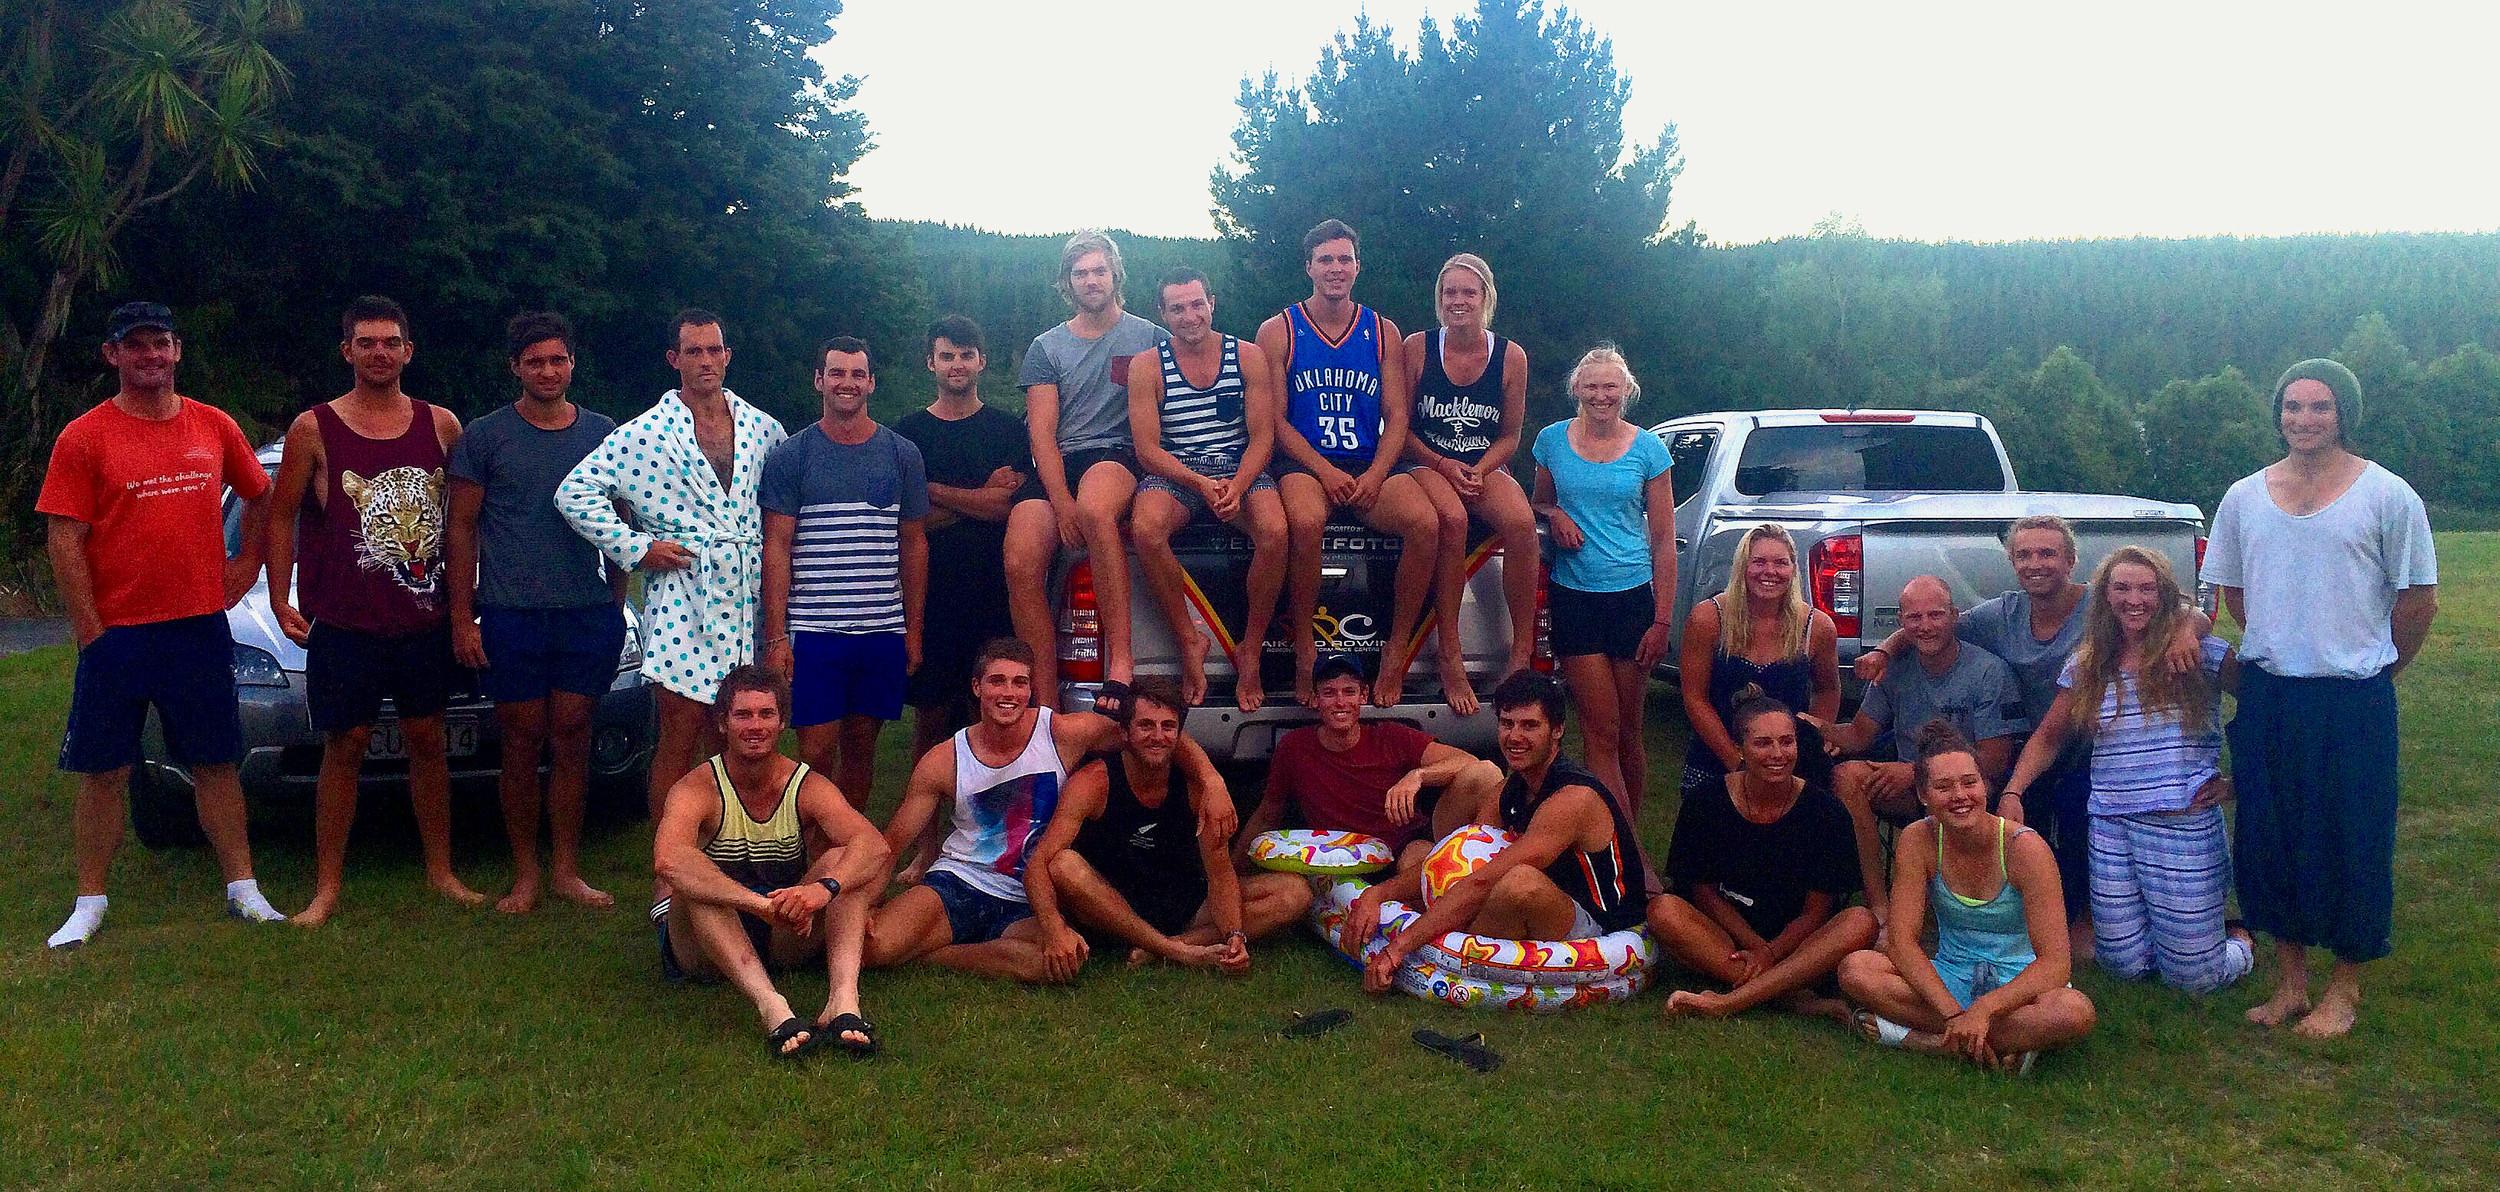 2015/16 Waikato Regional Performance Centre annual training camp